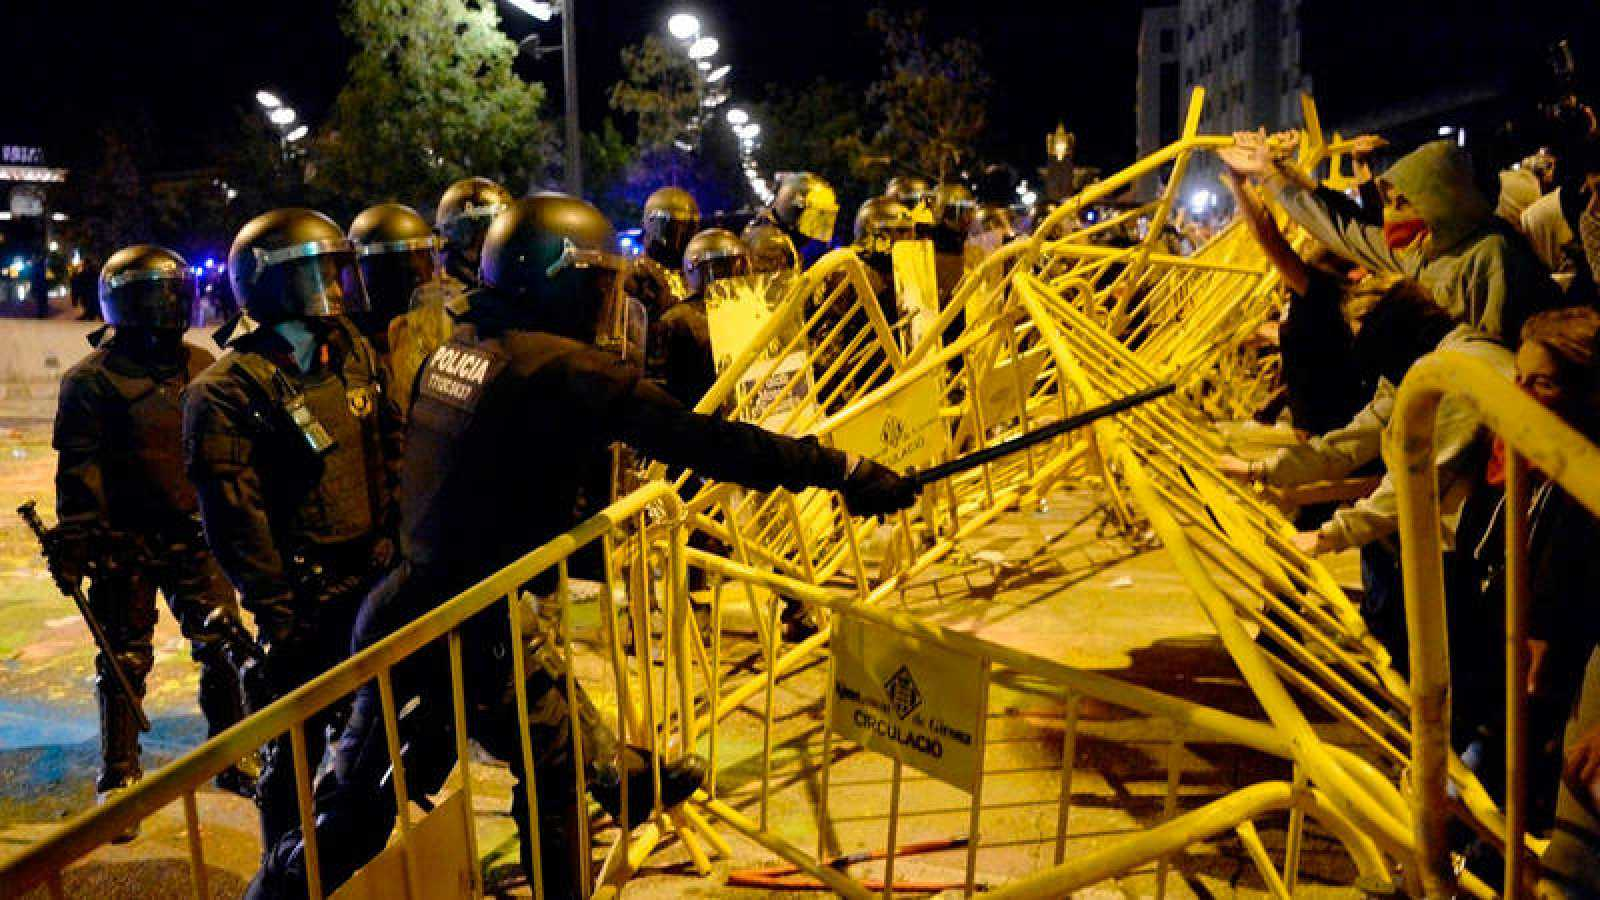 La ruta del odio catalana